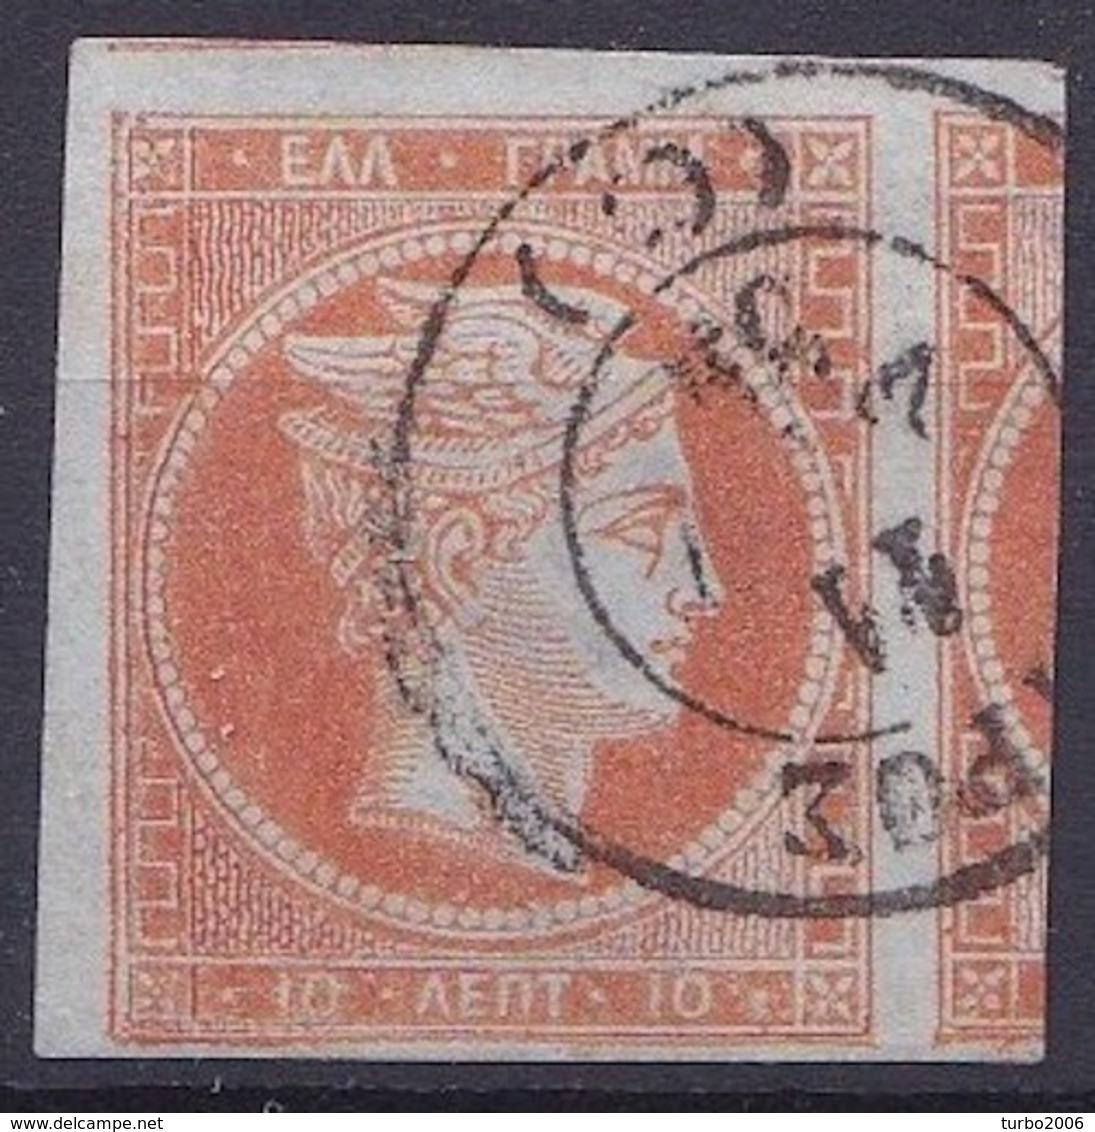 GREECE 1862-67 Large Hermes Head Consecutive Athens Prints 10 L Orange / Bluegreen Thin Paper Vl. 31 E - 1861-86 Hermes, Groot